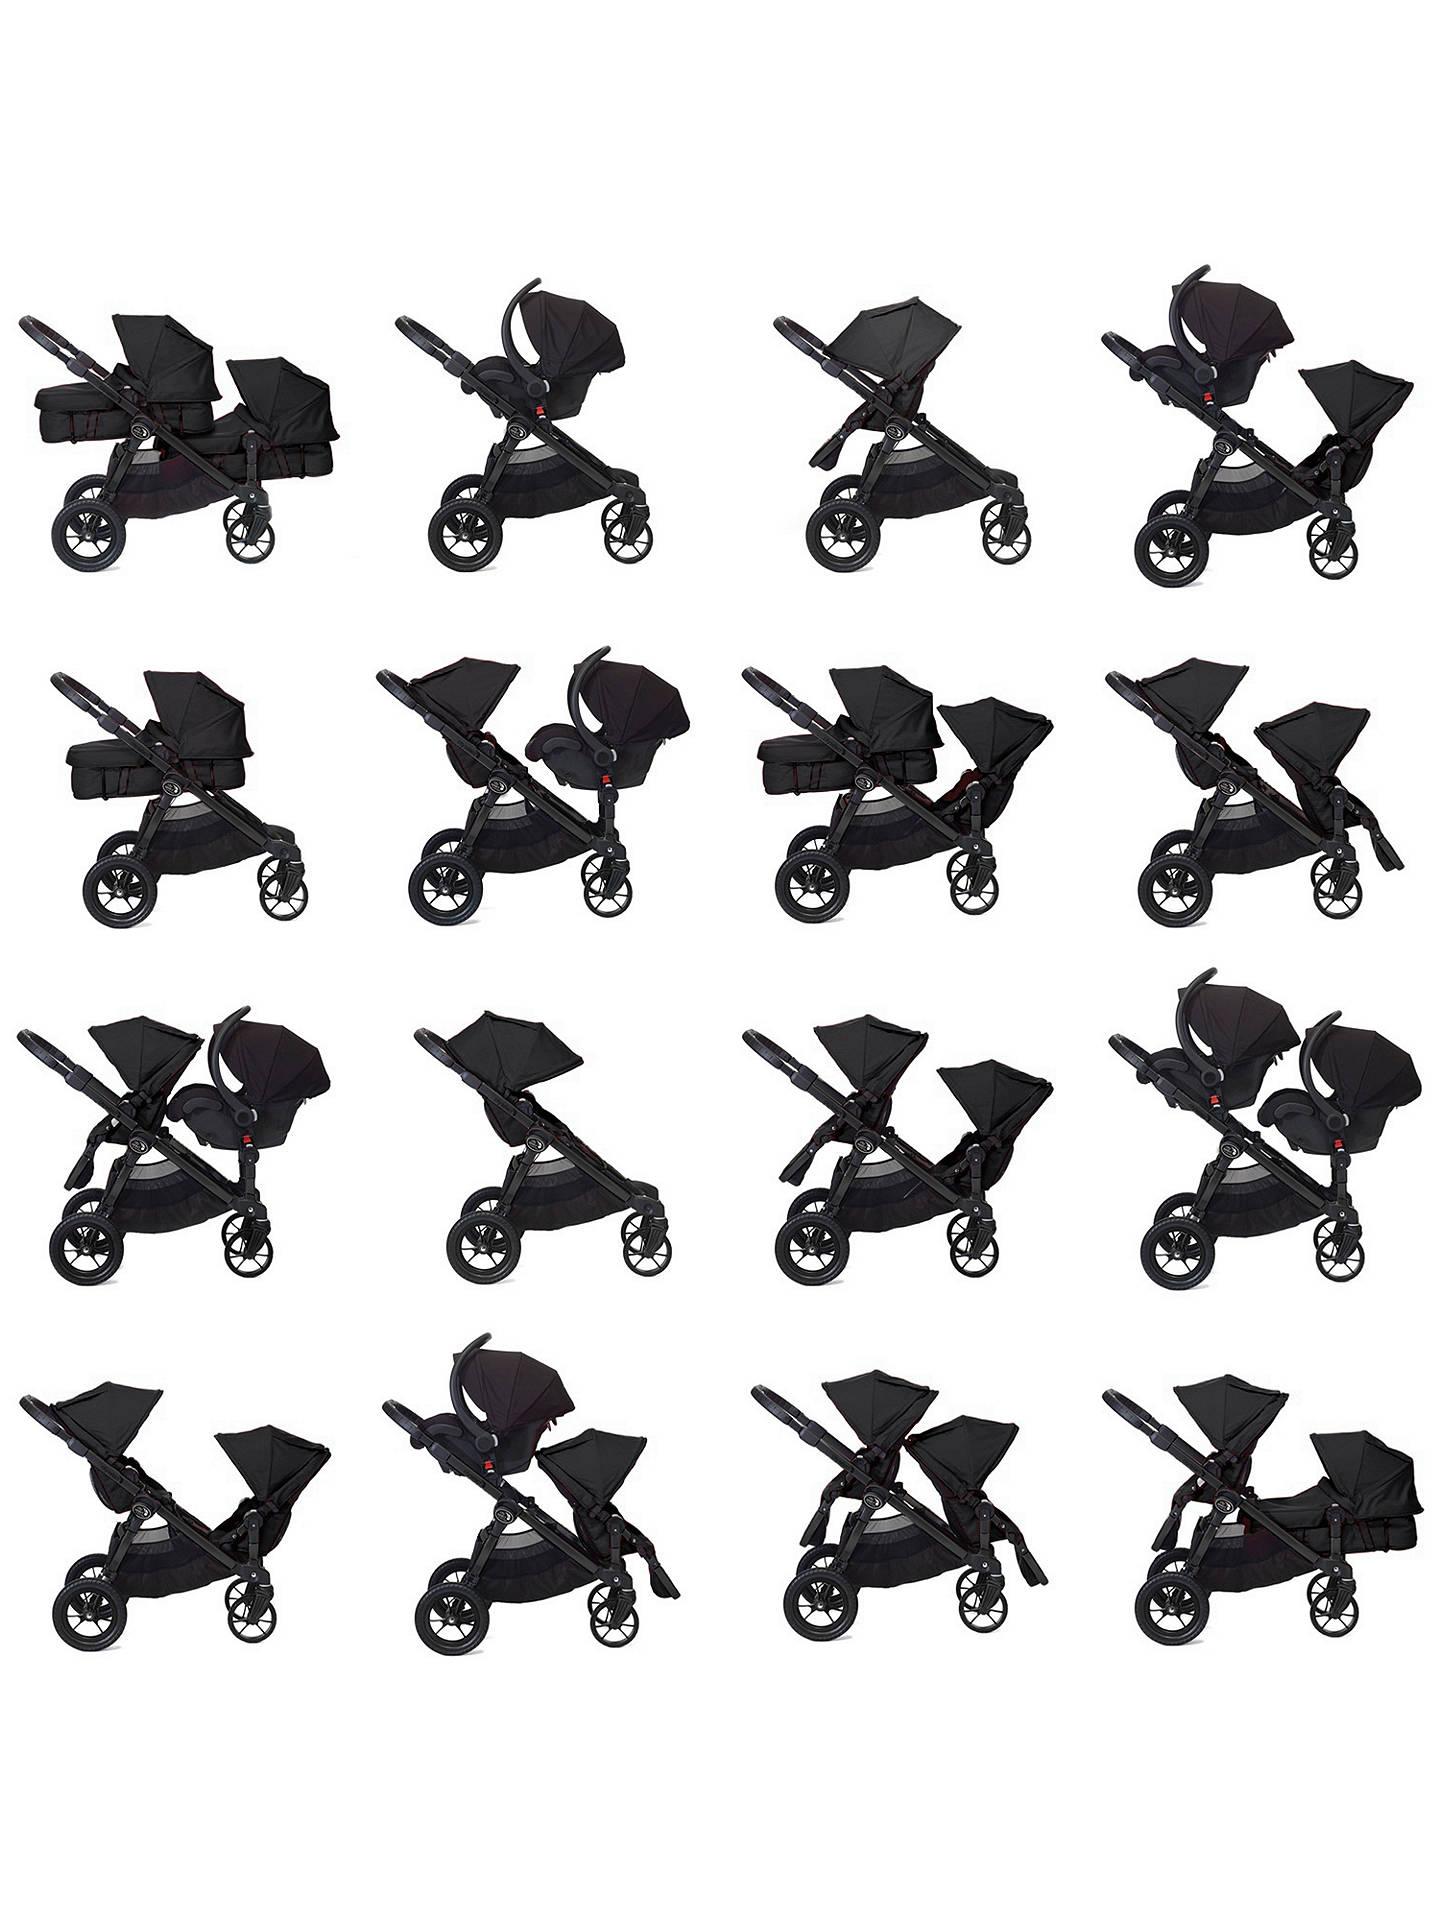 Baby Jogger City Select Pushchair Black At John Lewis Partners